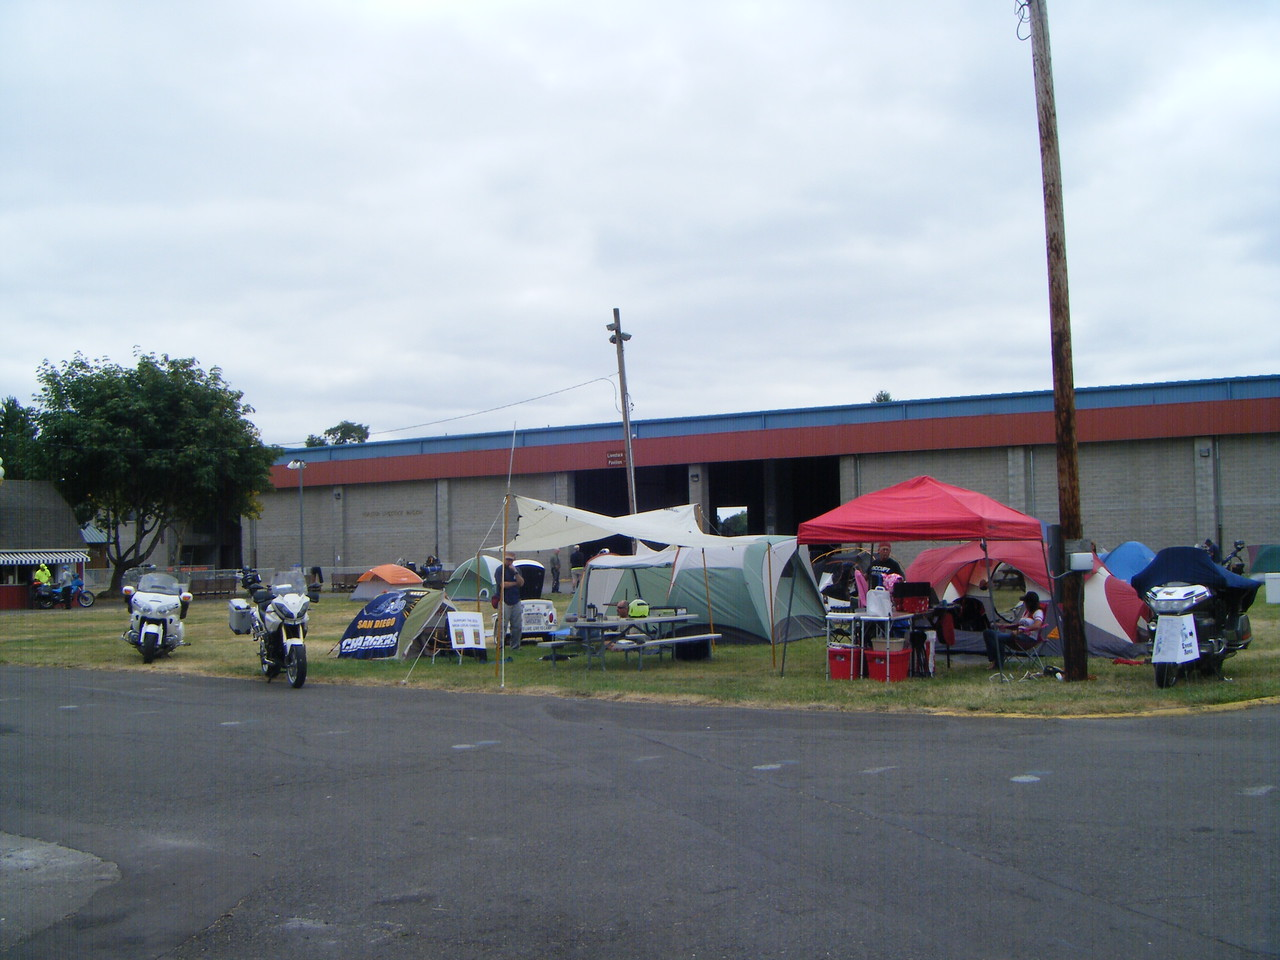 Salem fairgrounds